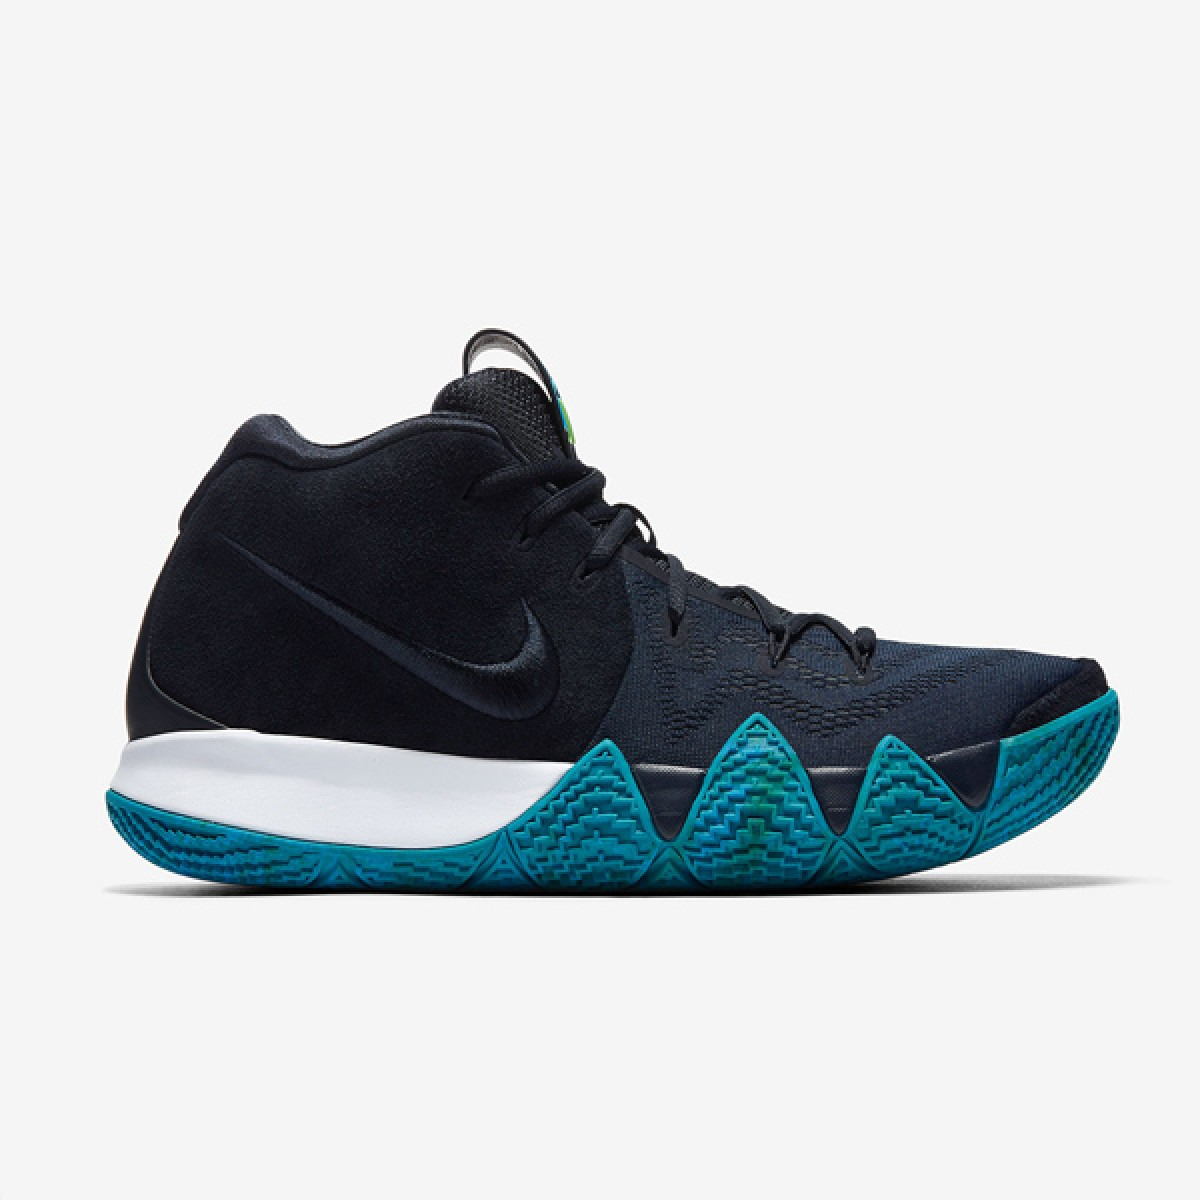 Nike Kyrie 4 'Obsidian'